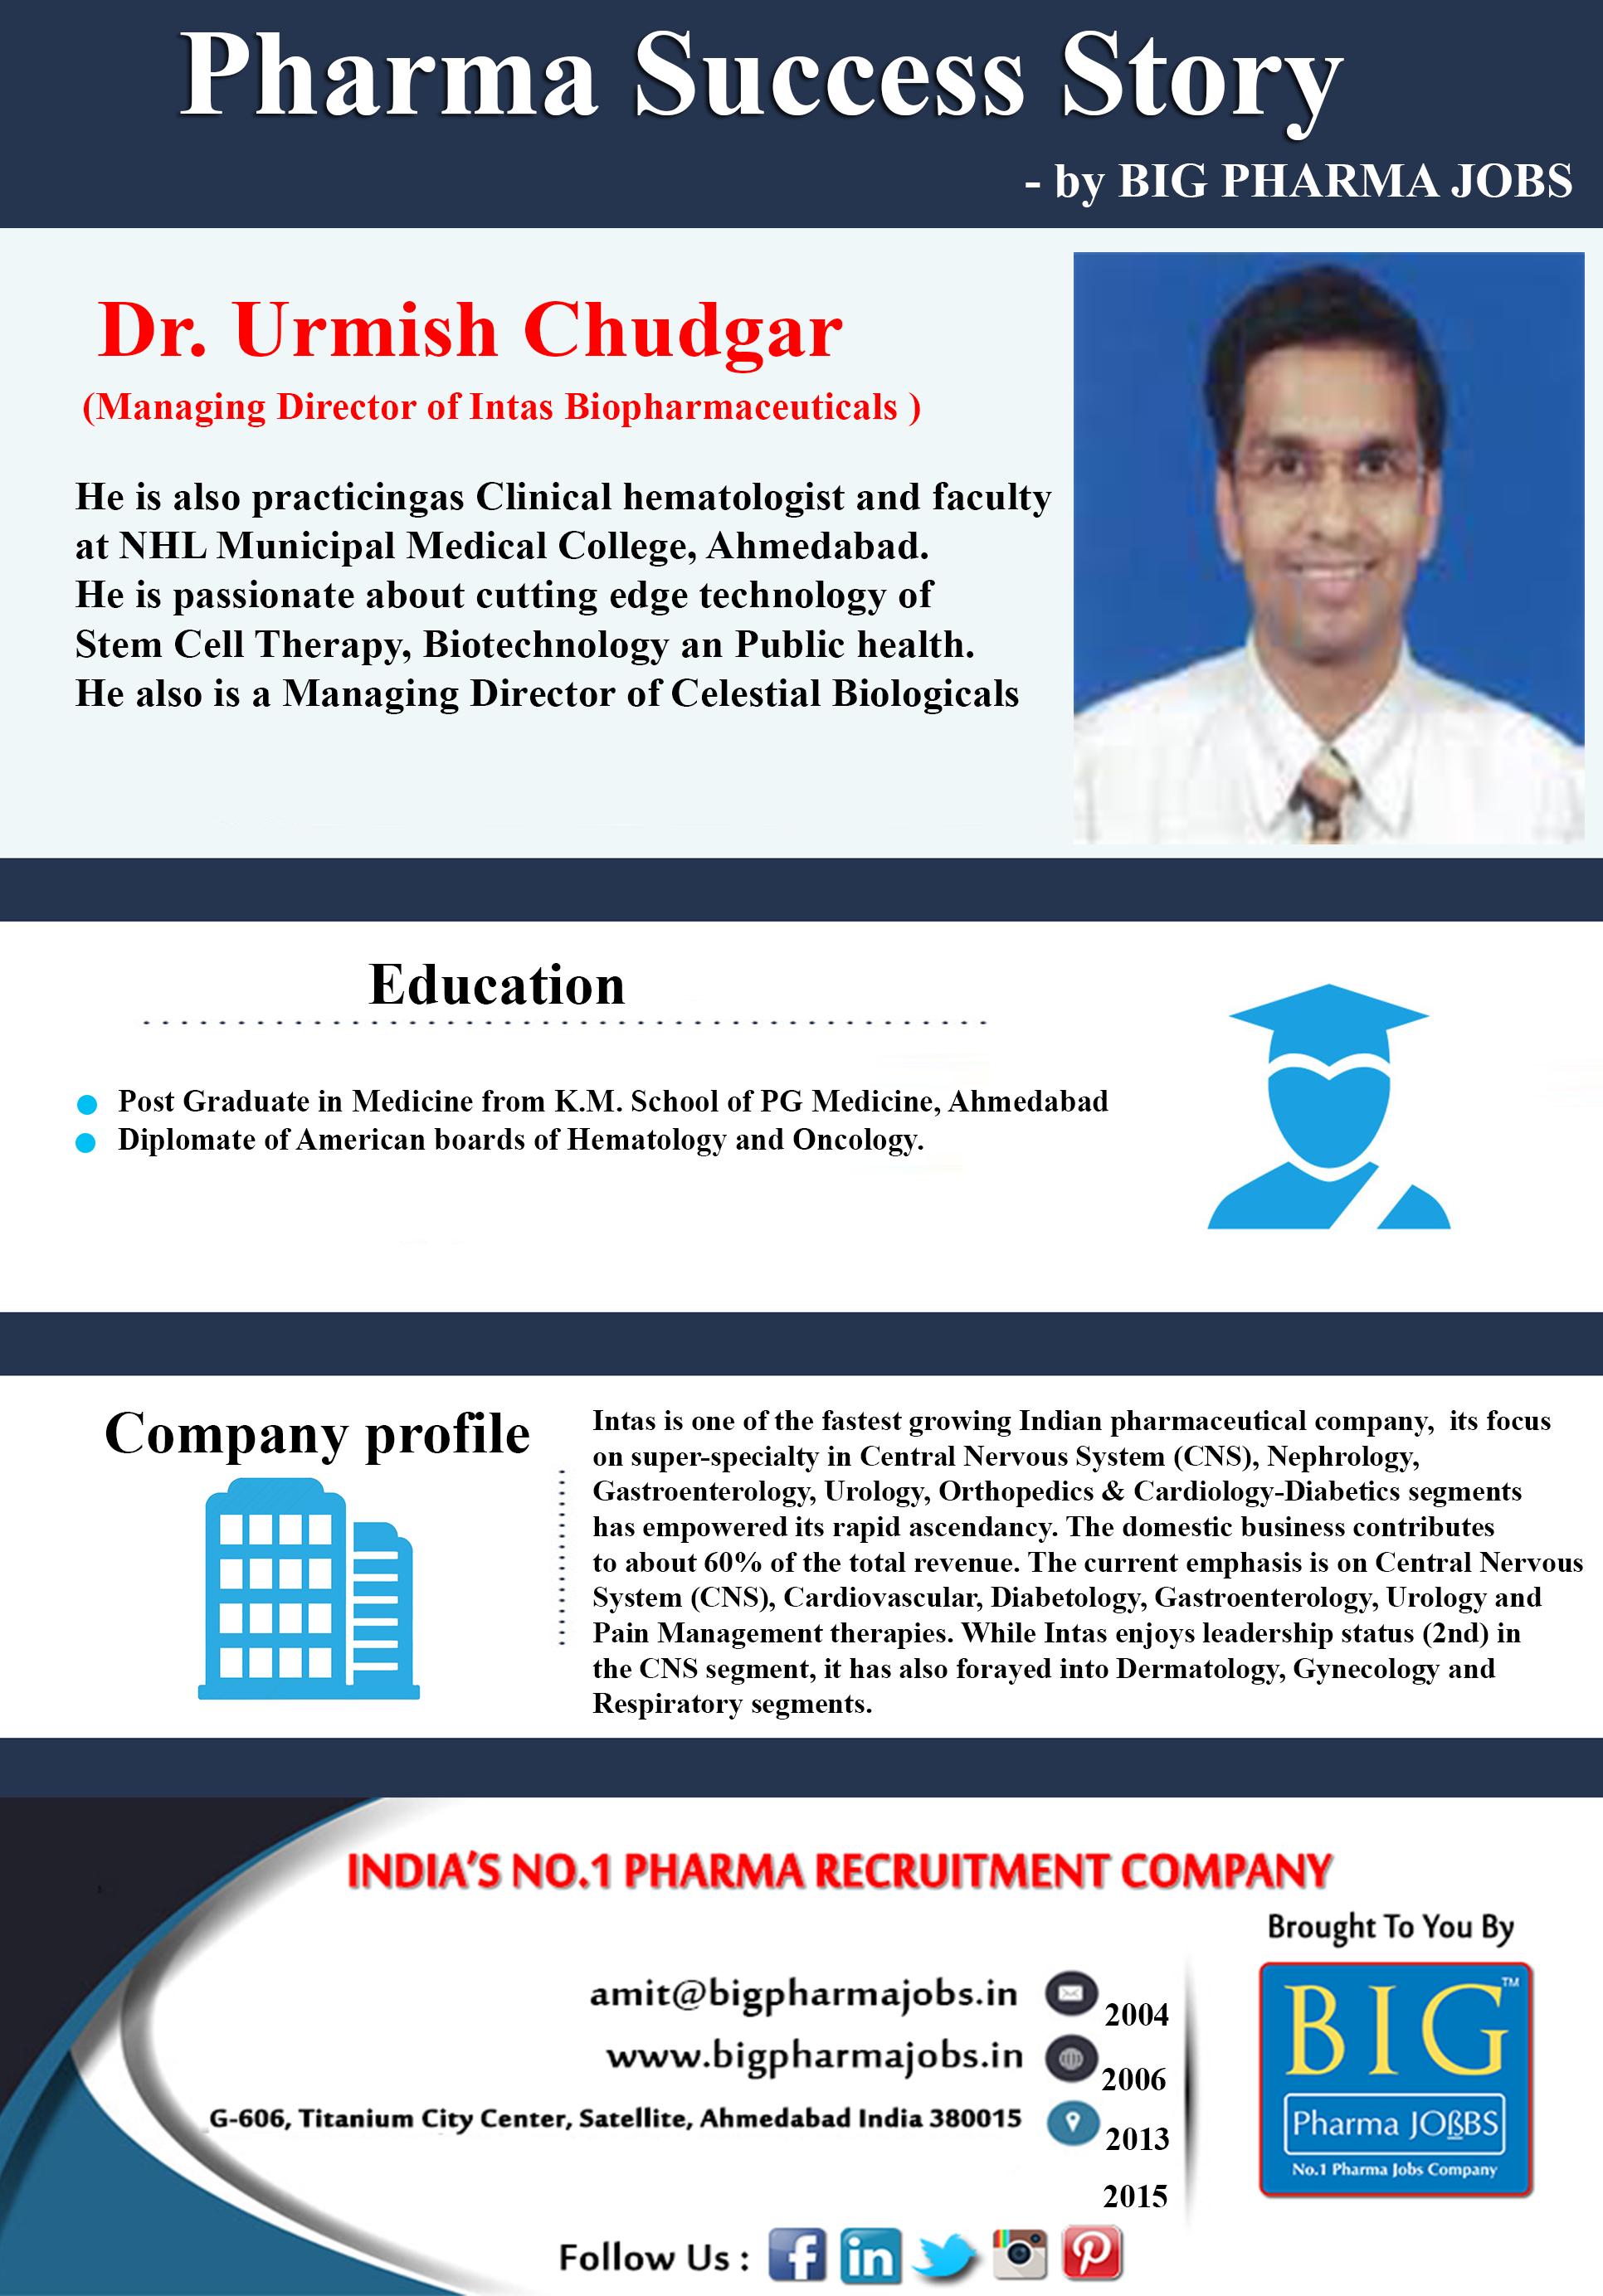 Pin by Big Pharma Jobs on Pharma Success Stories Medical